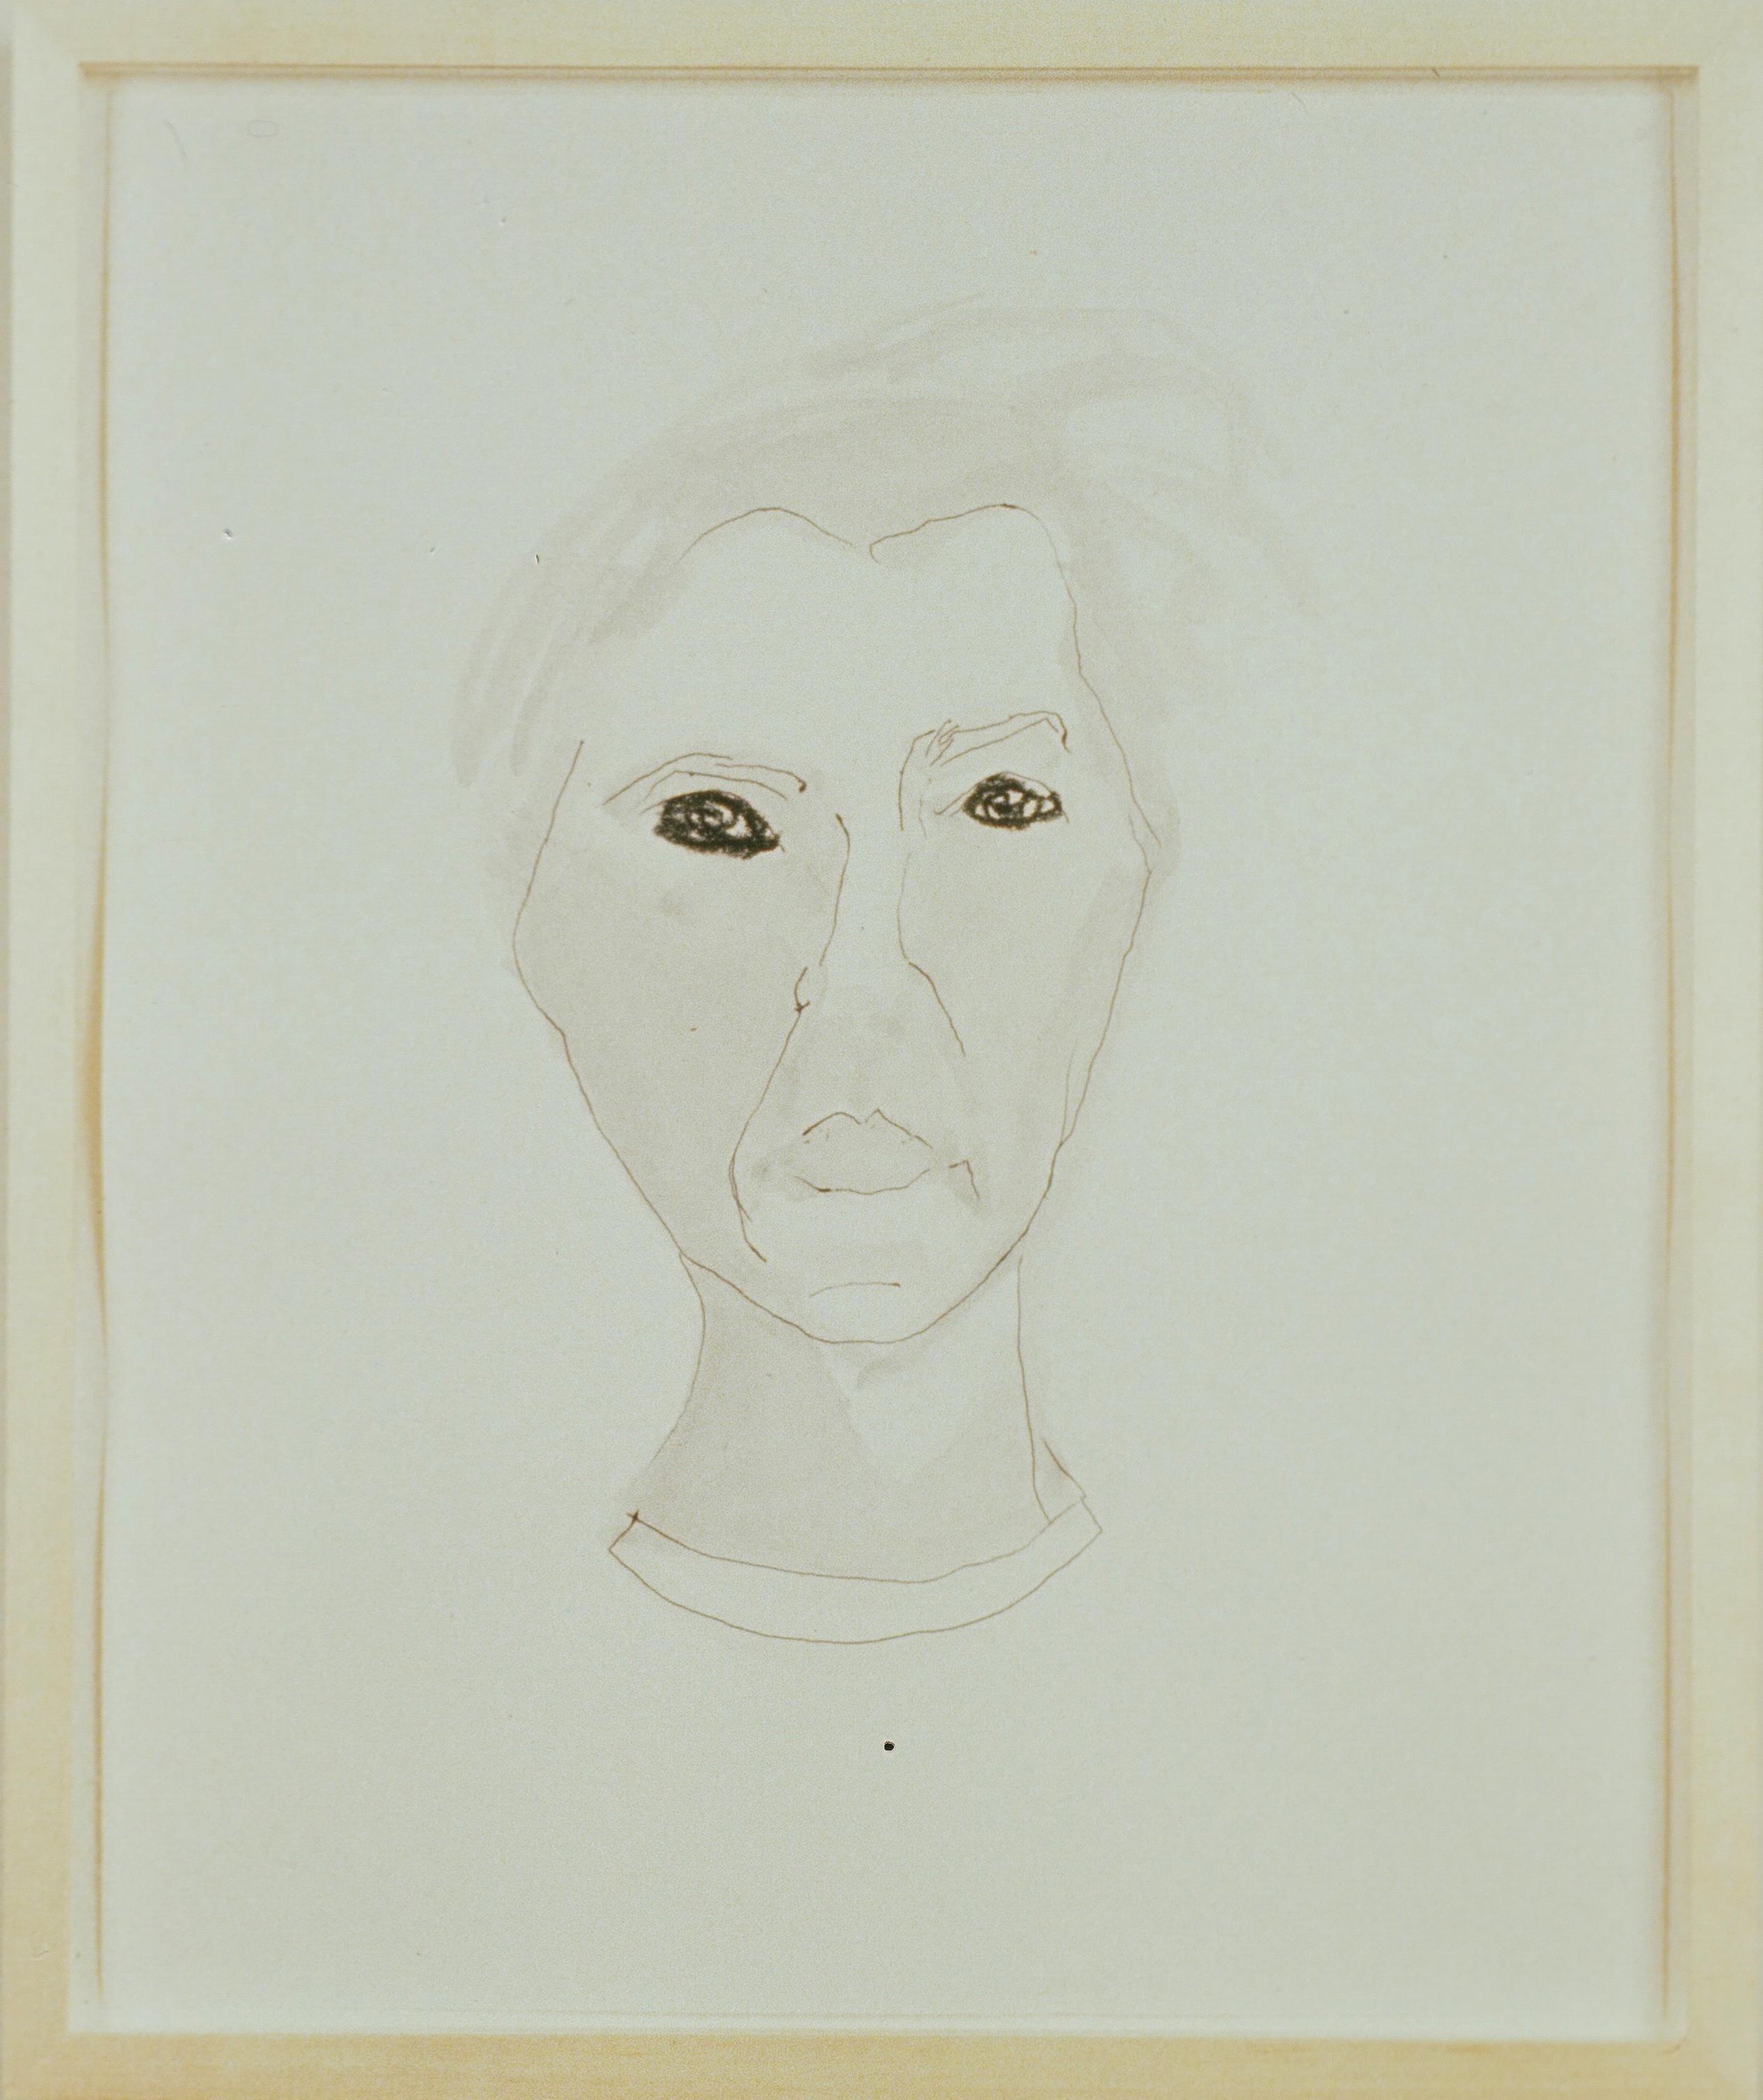 1991 - Self Portrait as Vase